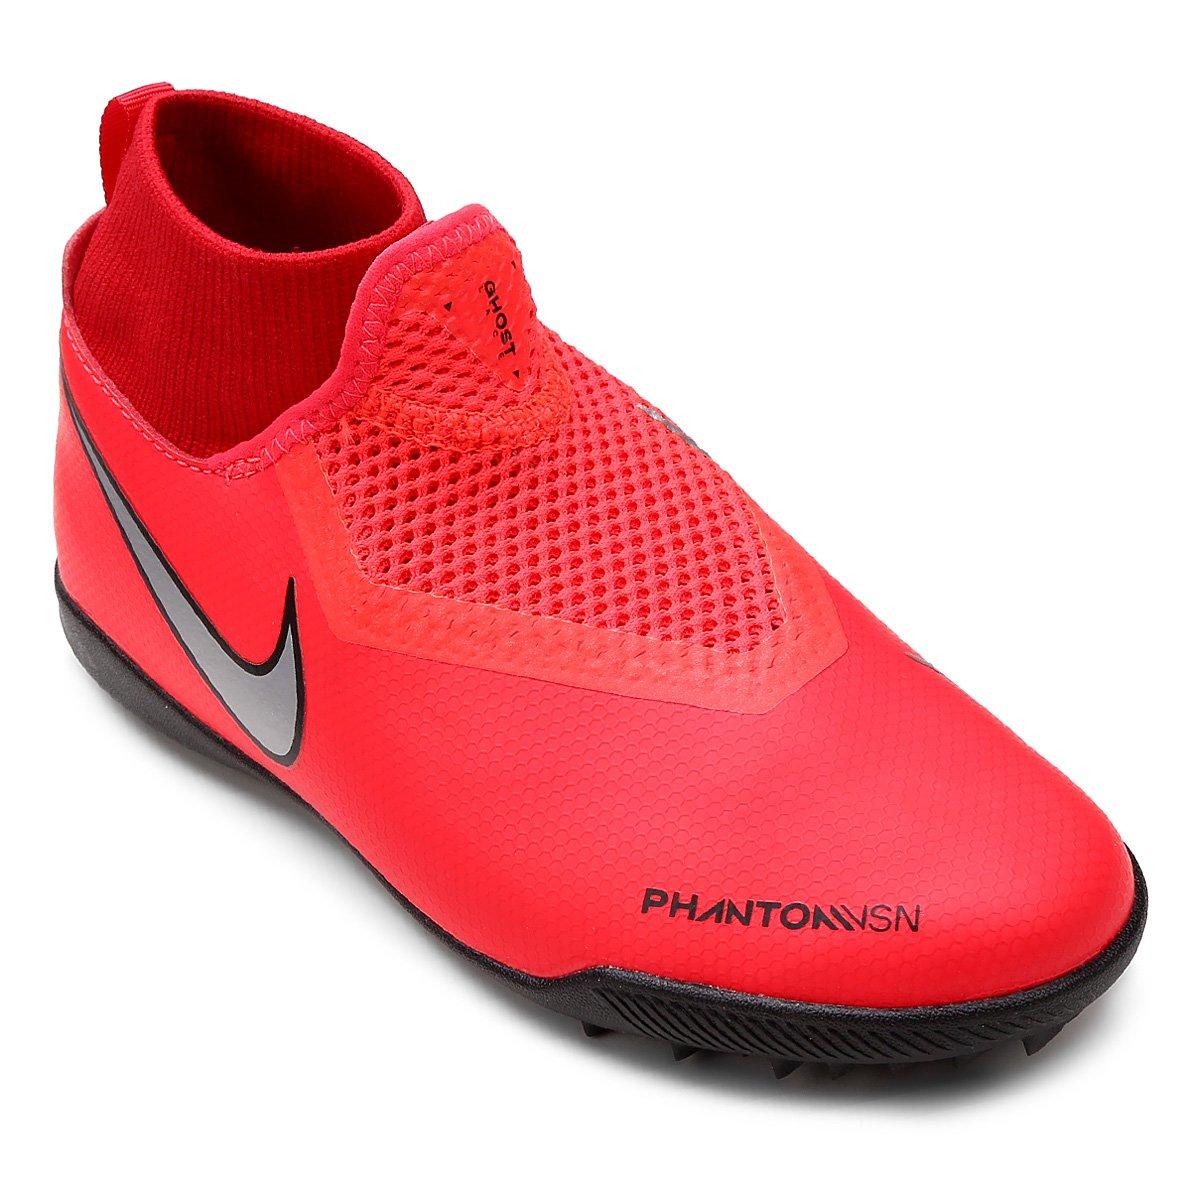 b2911dc4a1 Chuteira Society Infantil Nike Phantom Vision Academy TF